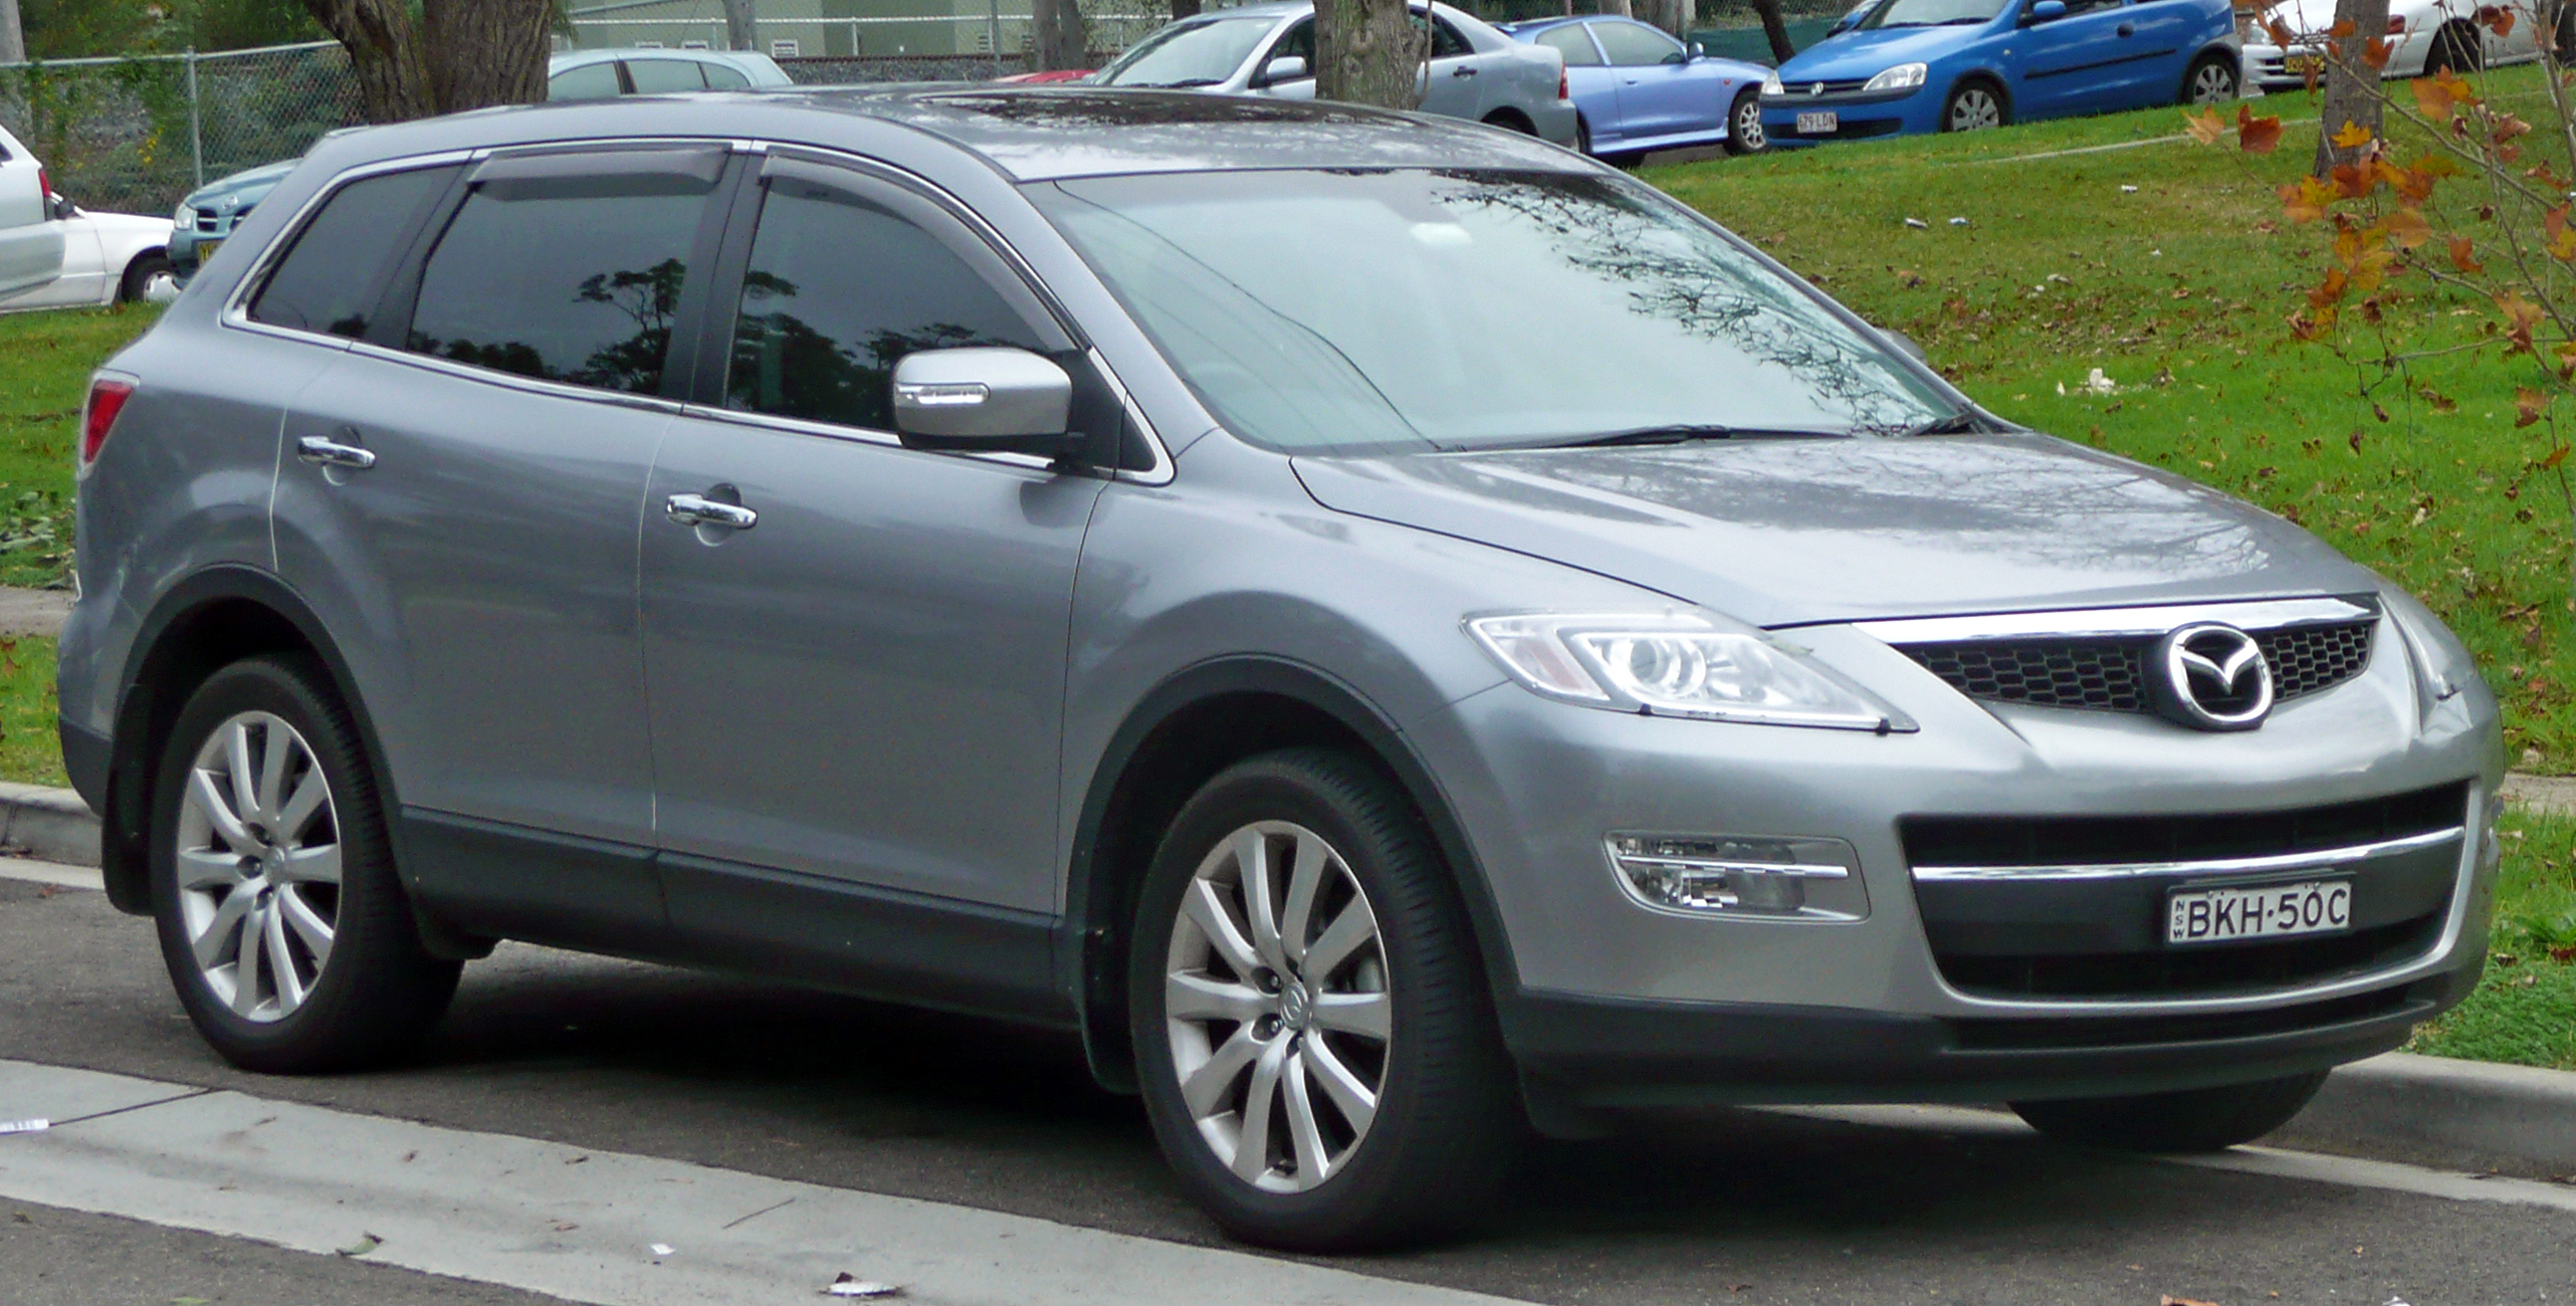 Mazda Cx9 2009 2019 2020 New Car Price And Reviews Timing Belt Cx 9 Image 16